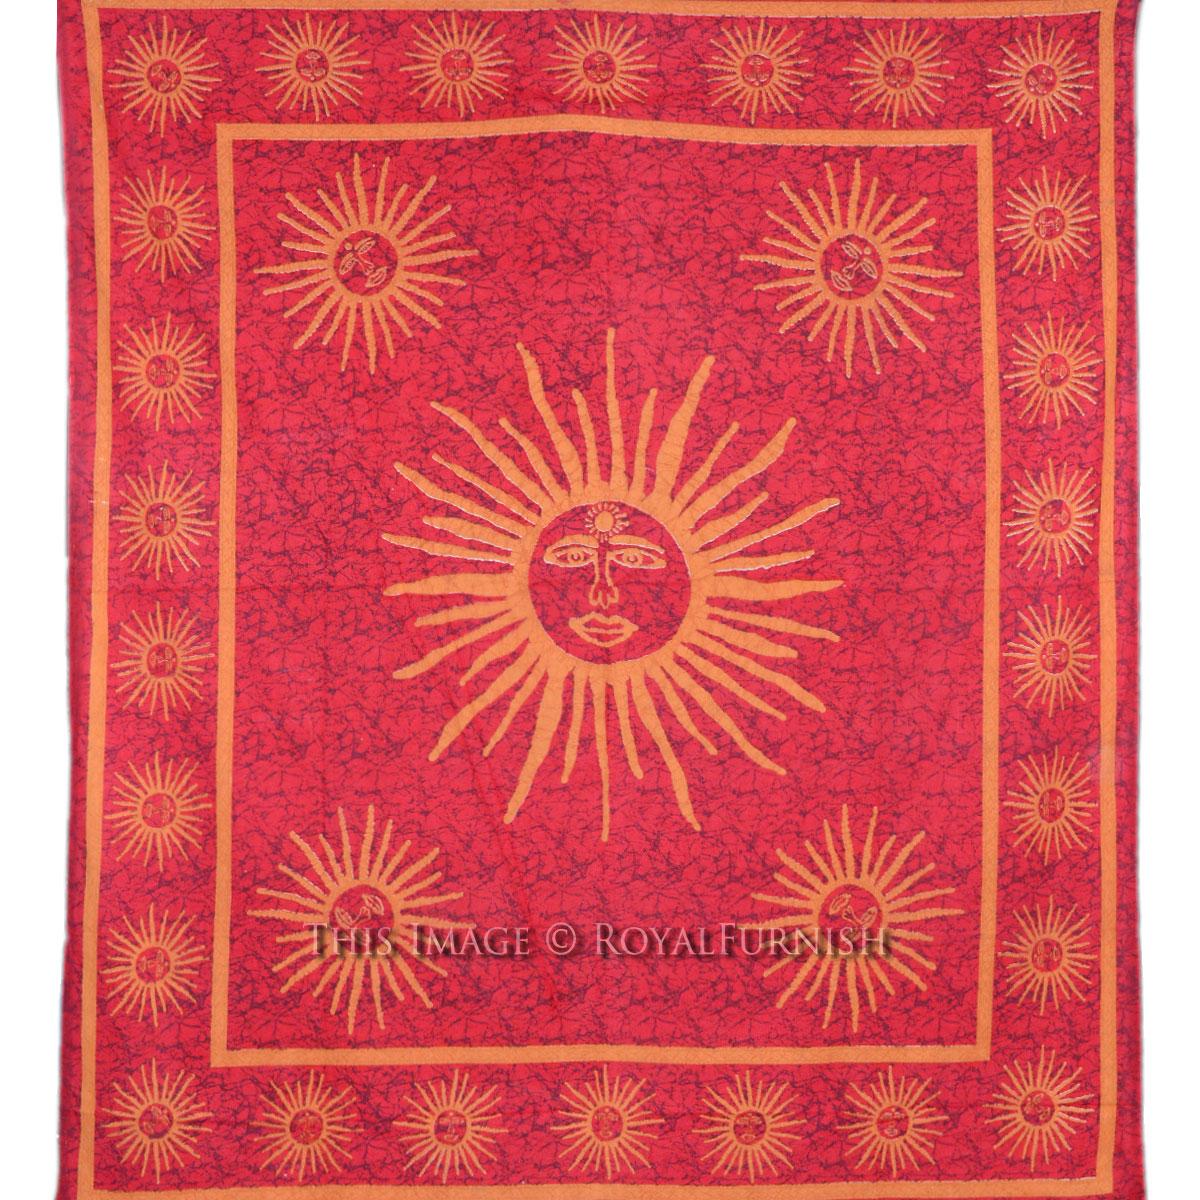 "90 x 84"" Red Large Celestial Burning Sun Cotton Tapestry Bedspread - RoyalFurnish.com"